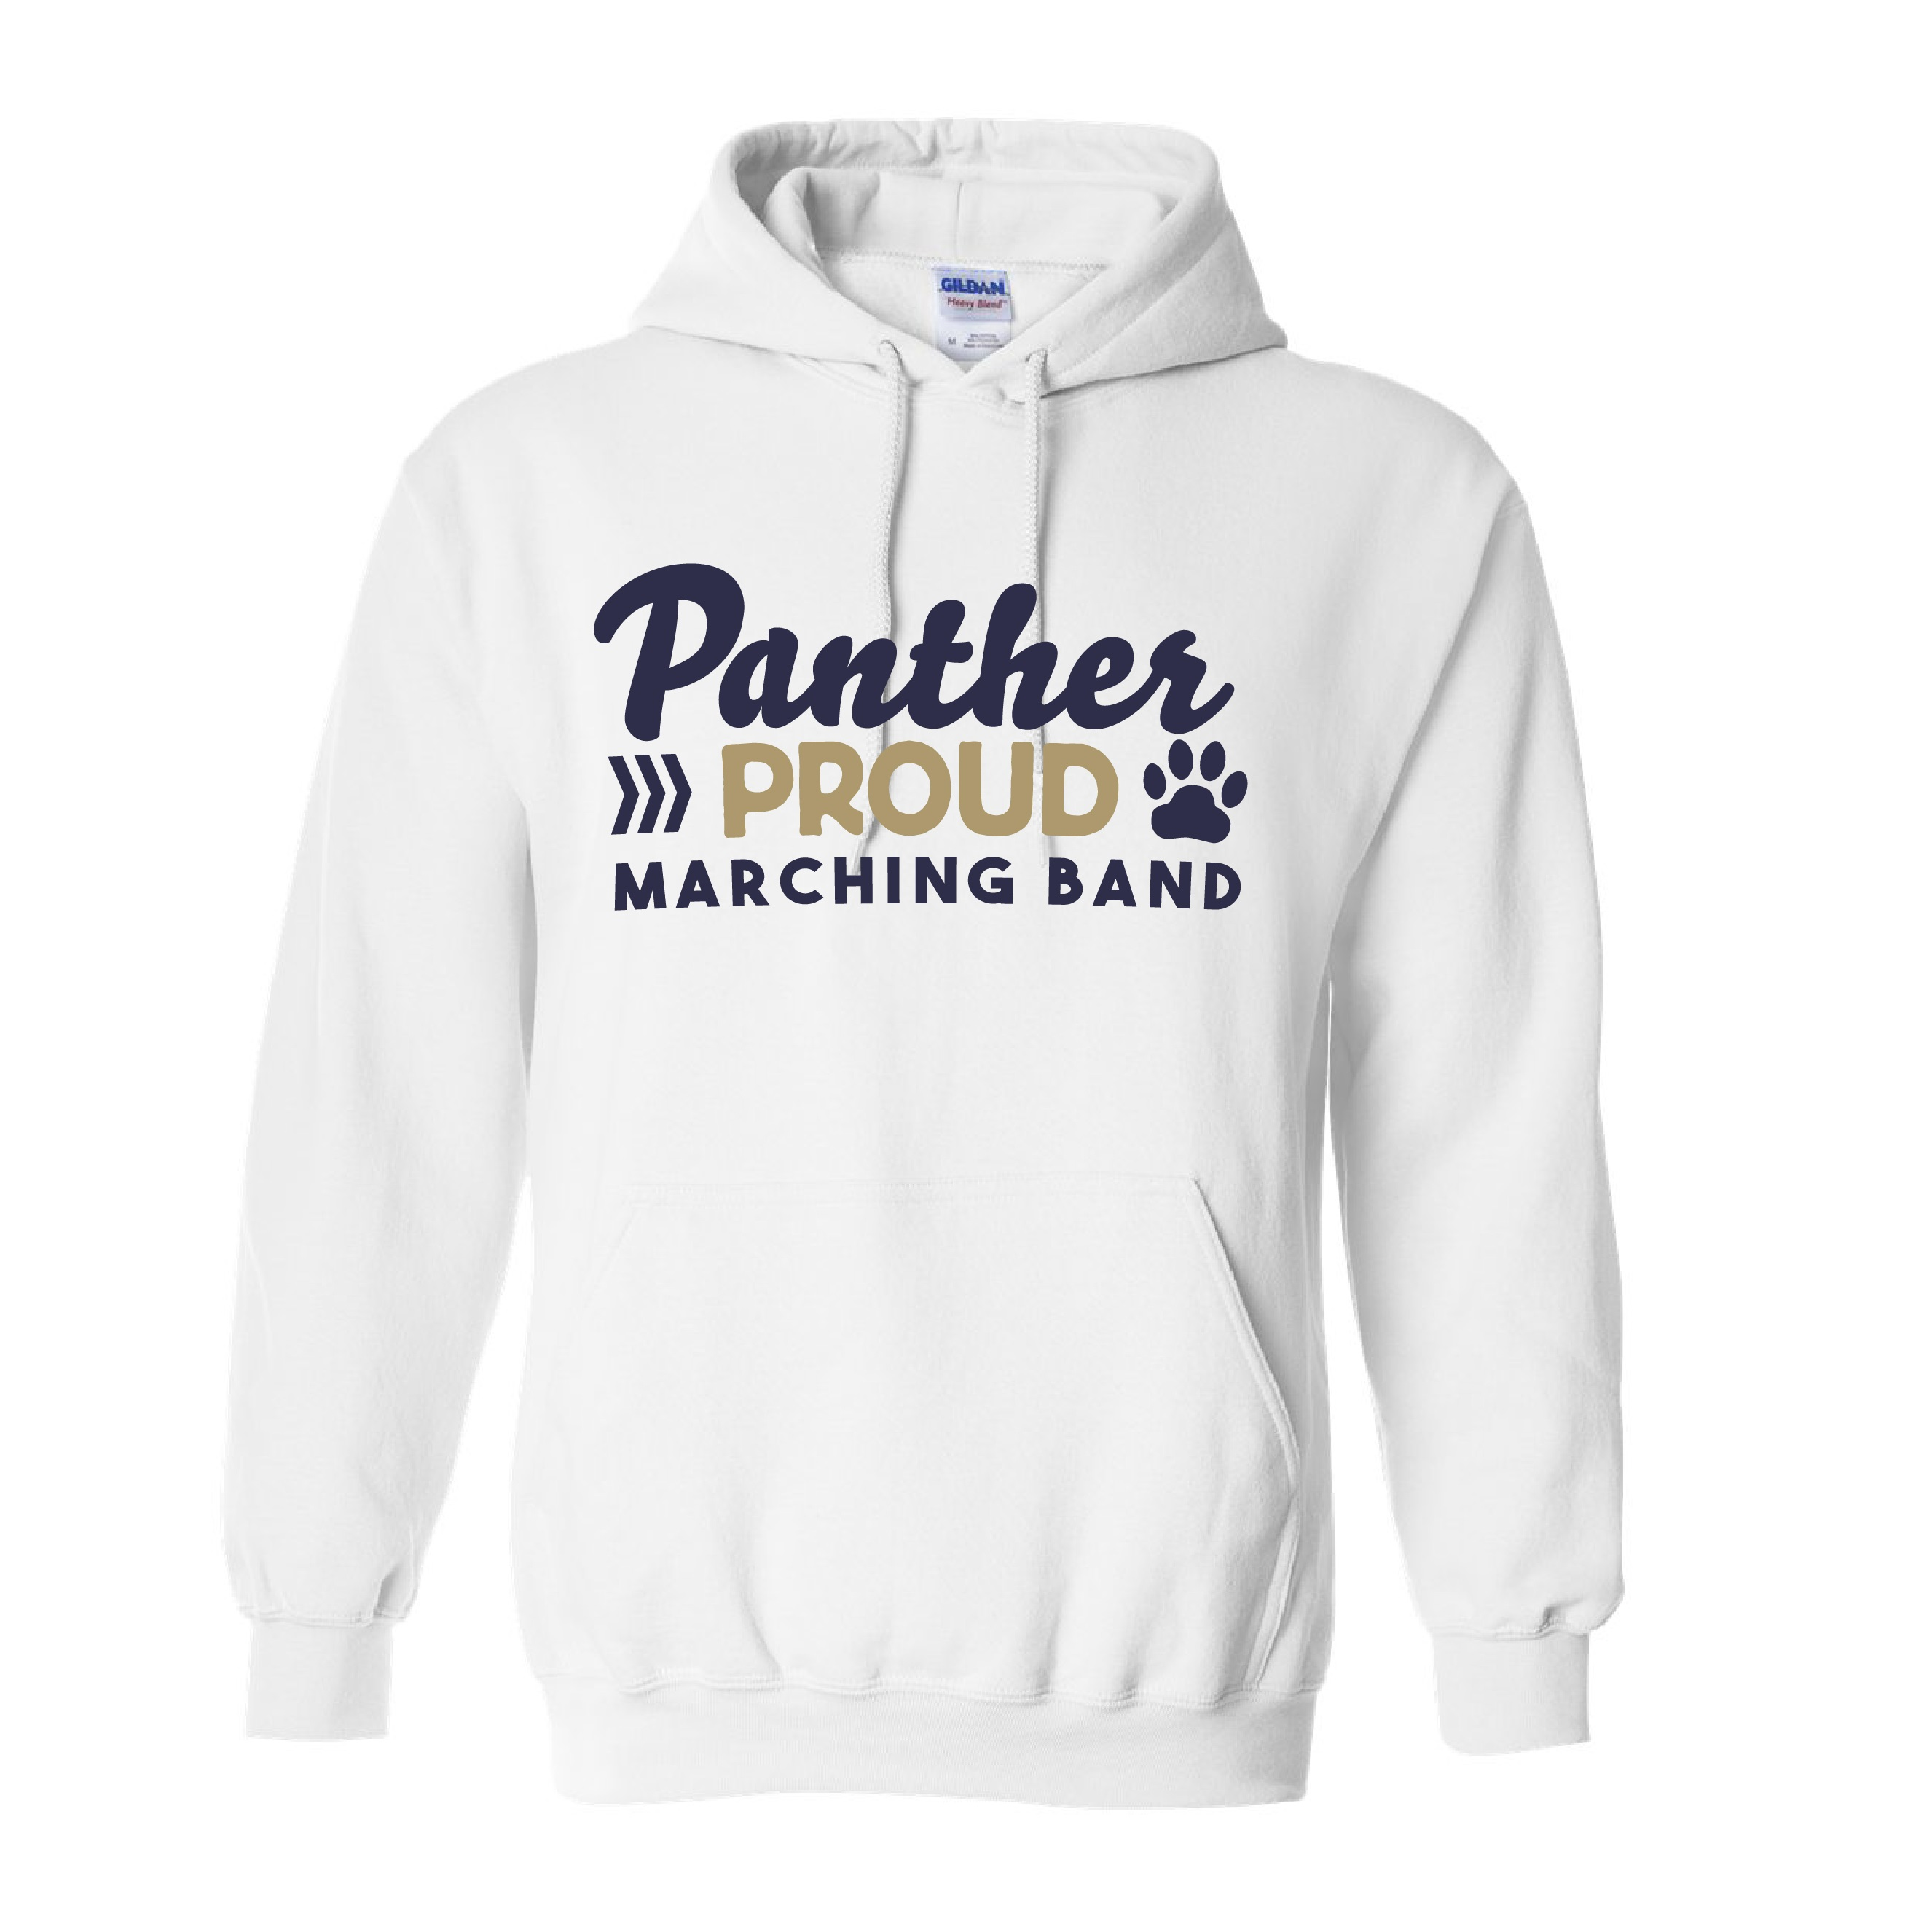 Gildan Heavy Blend Hooded Sweatshirt (Available in White or Grey)